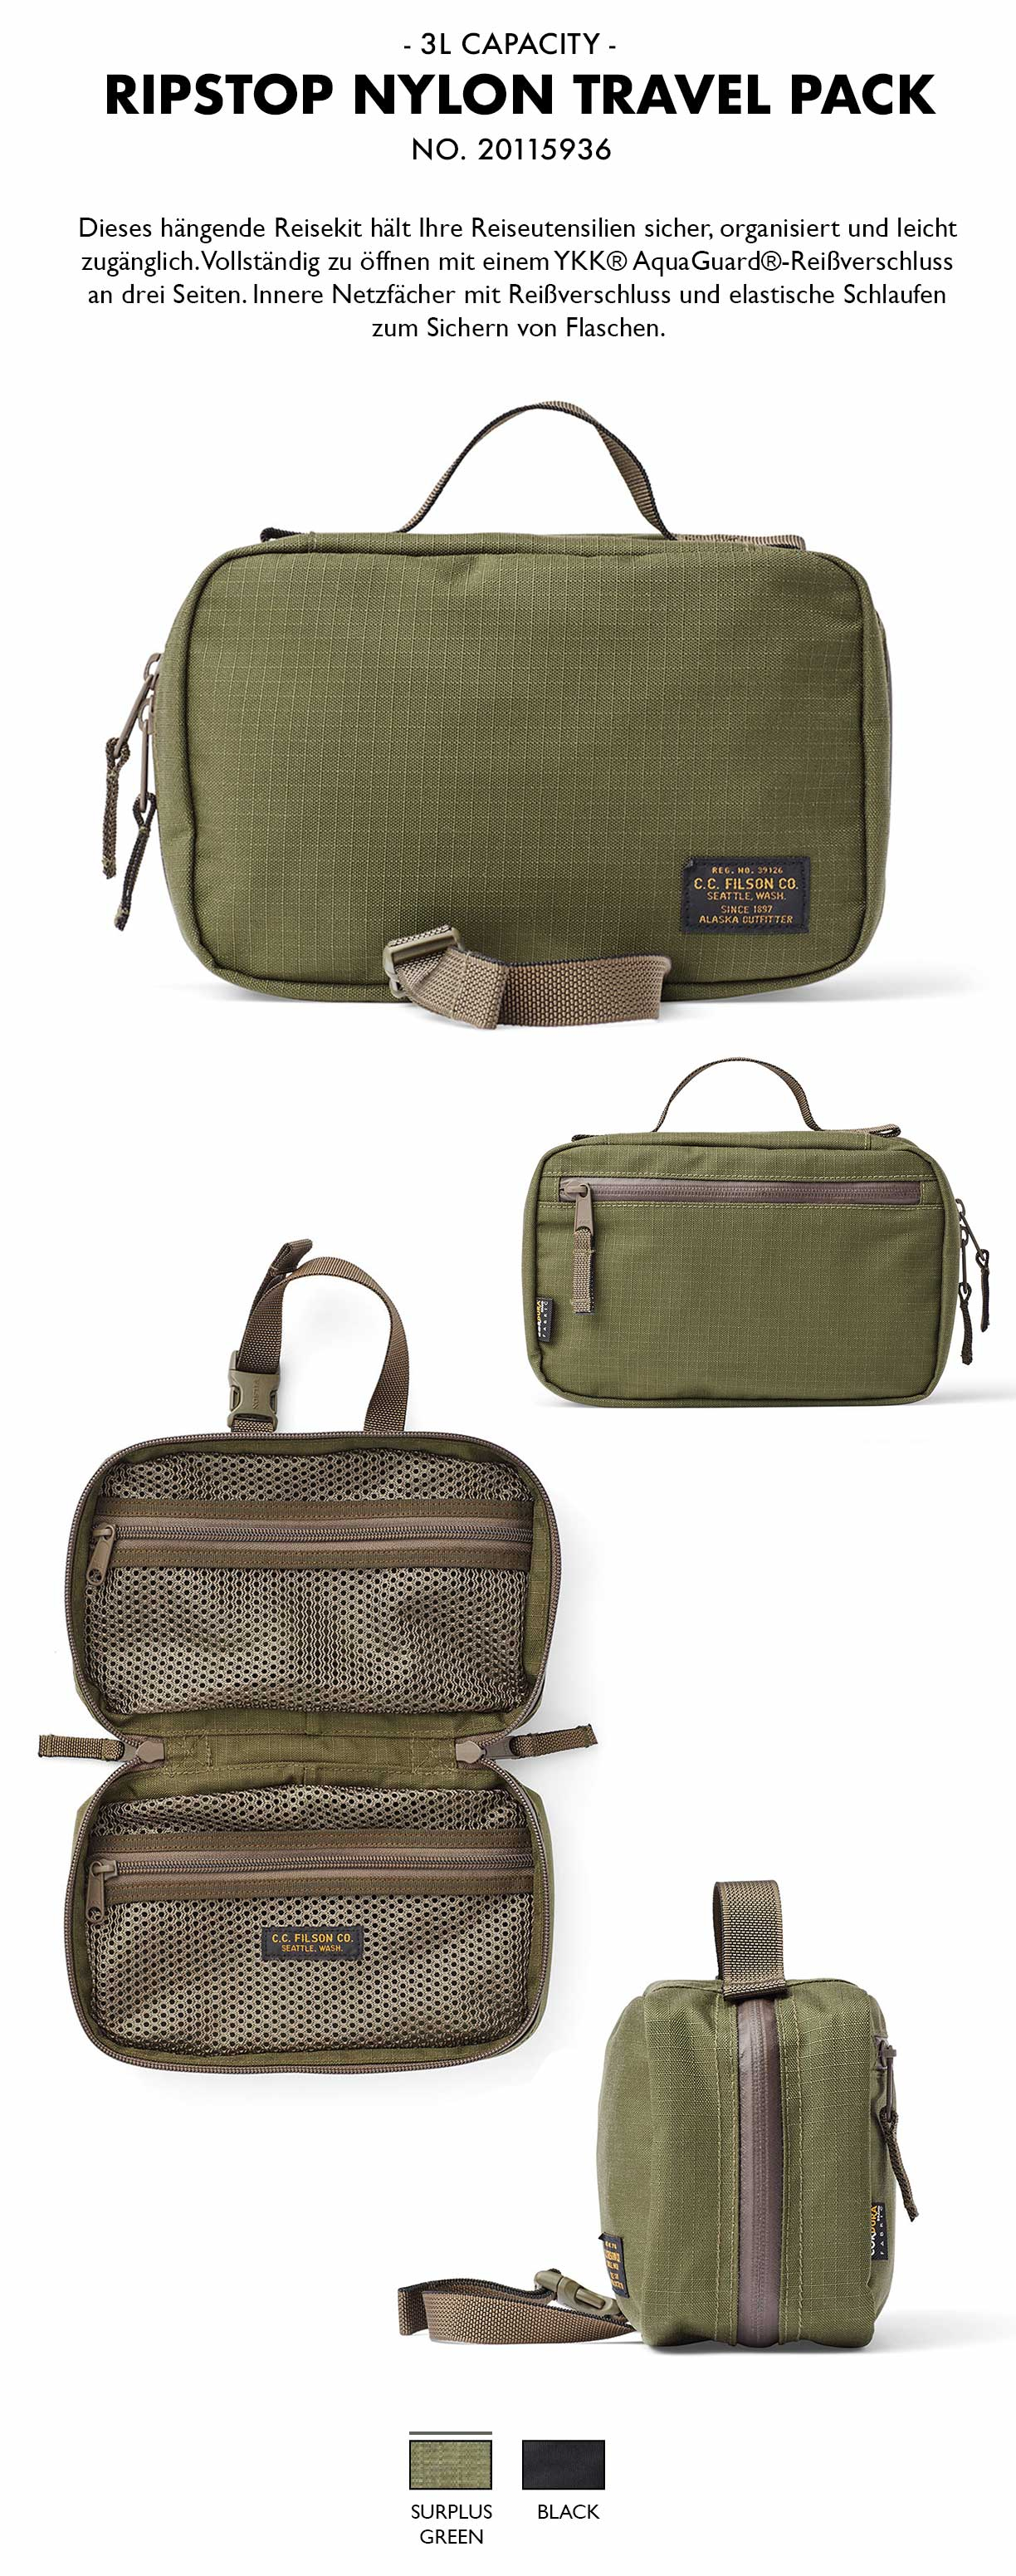 Filson Ripstop Nylon Travel Pack Surplus Green Produkt-informationen